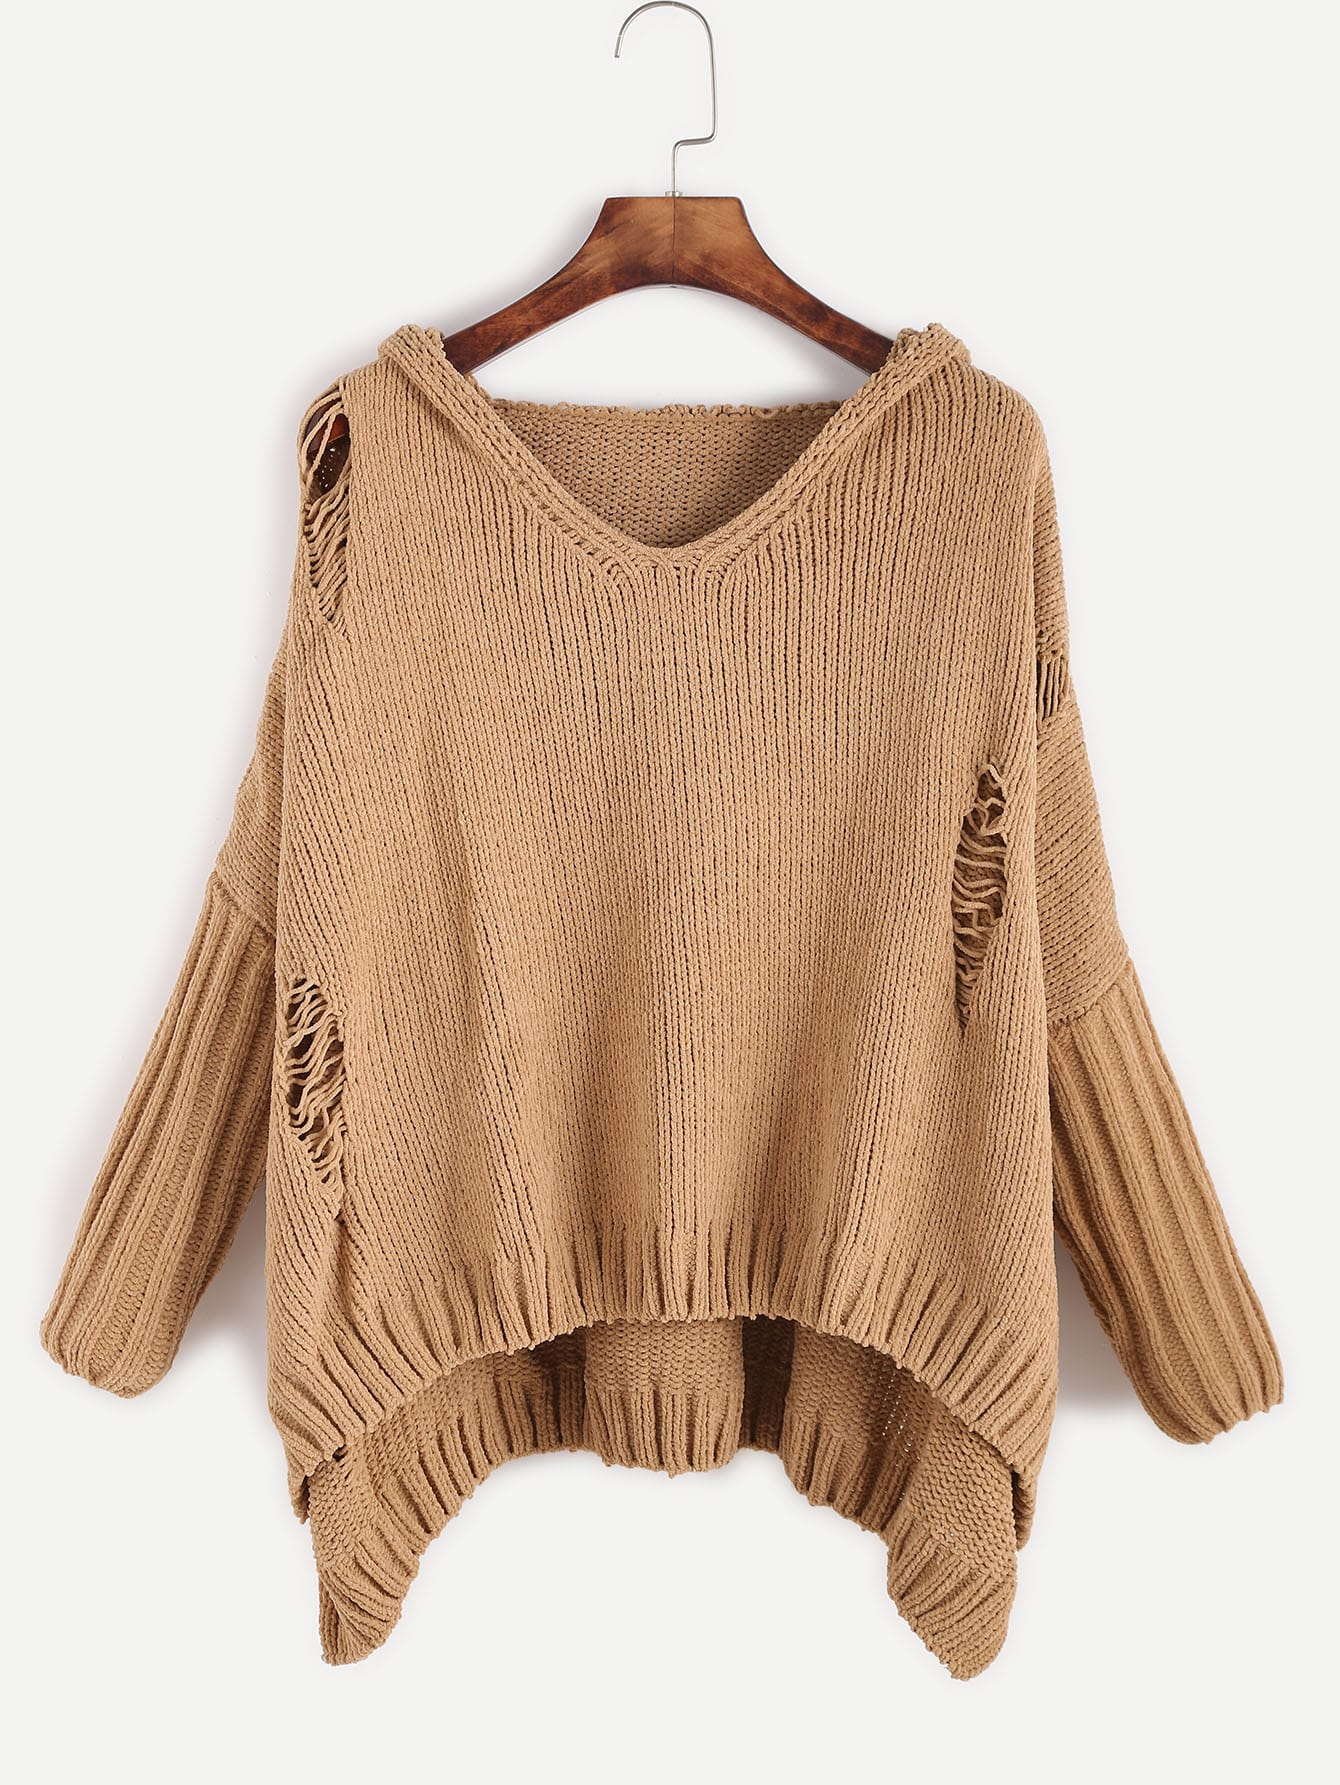 Khaki Ripped High Low Hooded SweaterKhaki Ripped High Low Hooded Sweater<br><br>color: Khaki<br>size: one-size